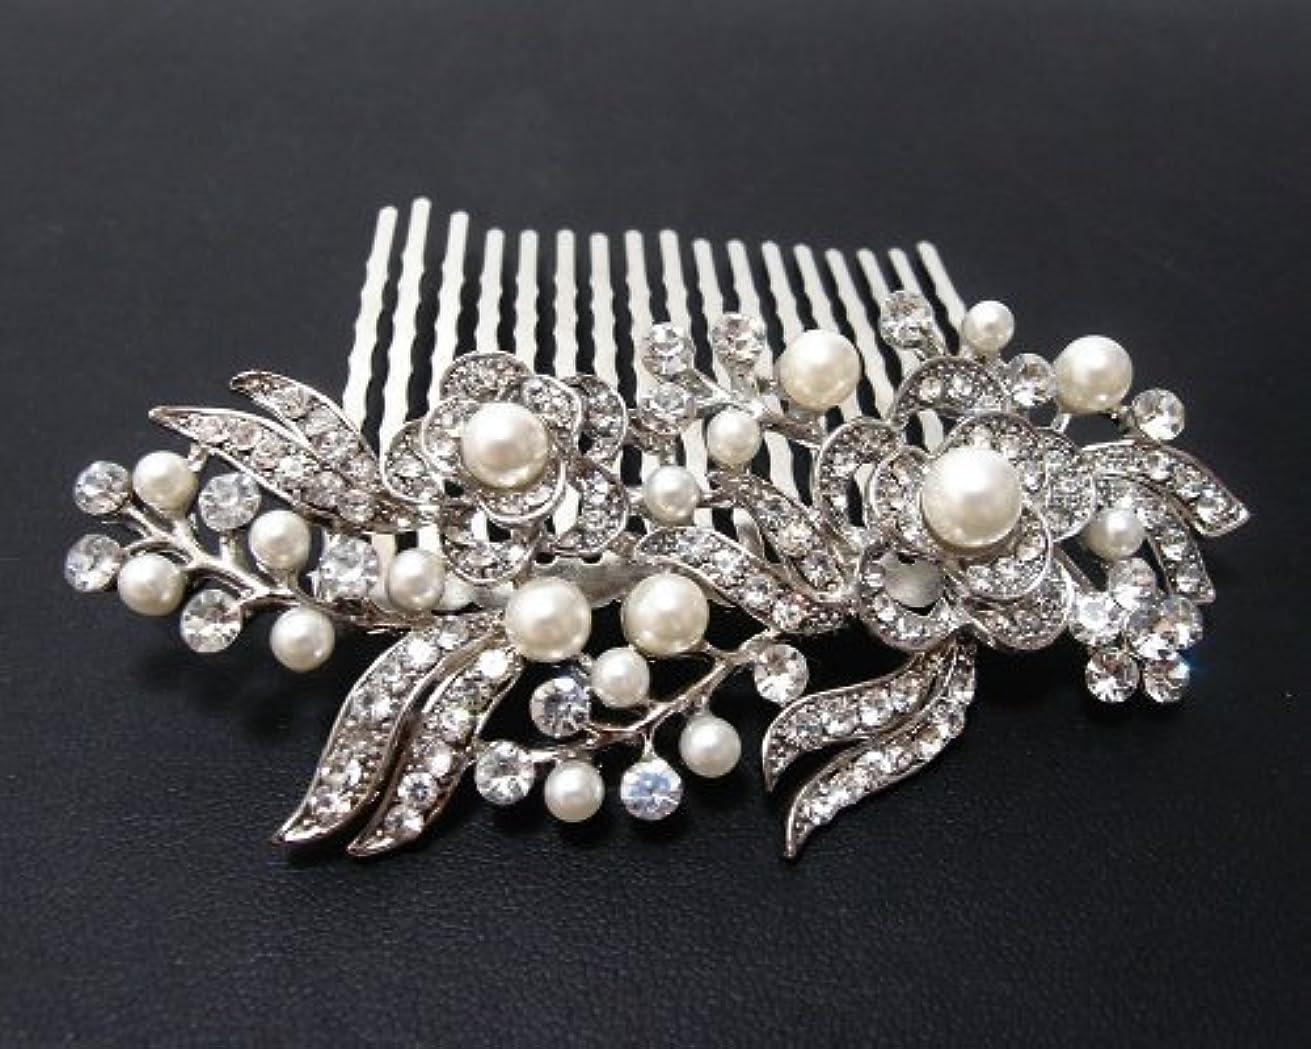 beautiful elegant wedding bridal hair comb pearl and crystal #222 by beautyxyz [並行輸入品]